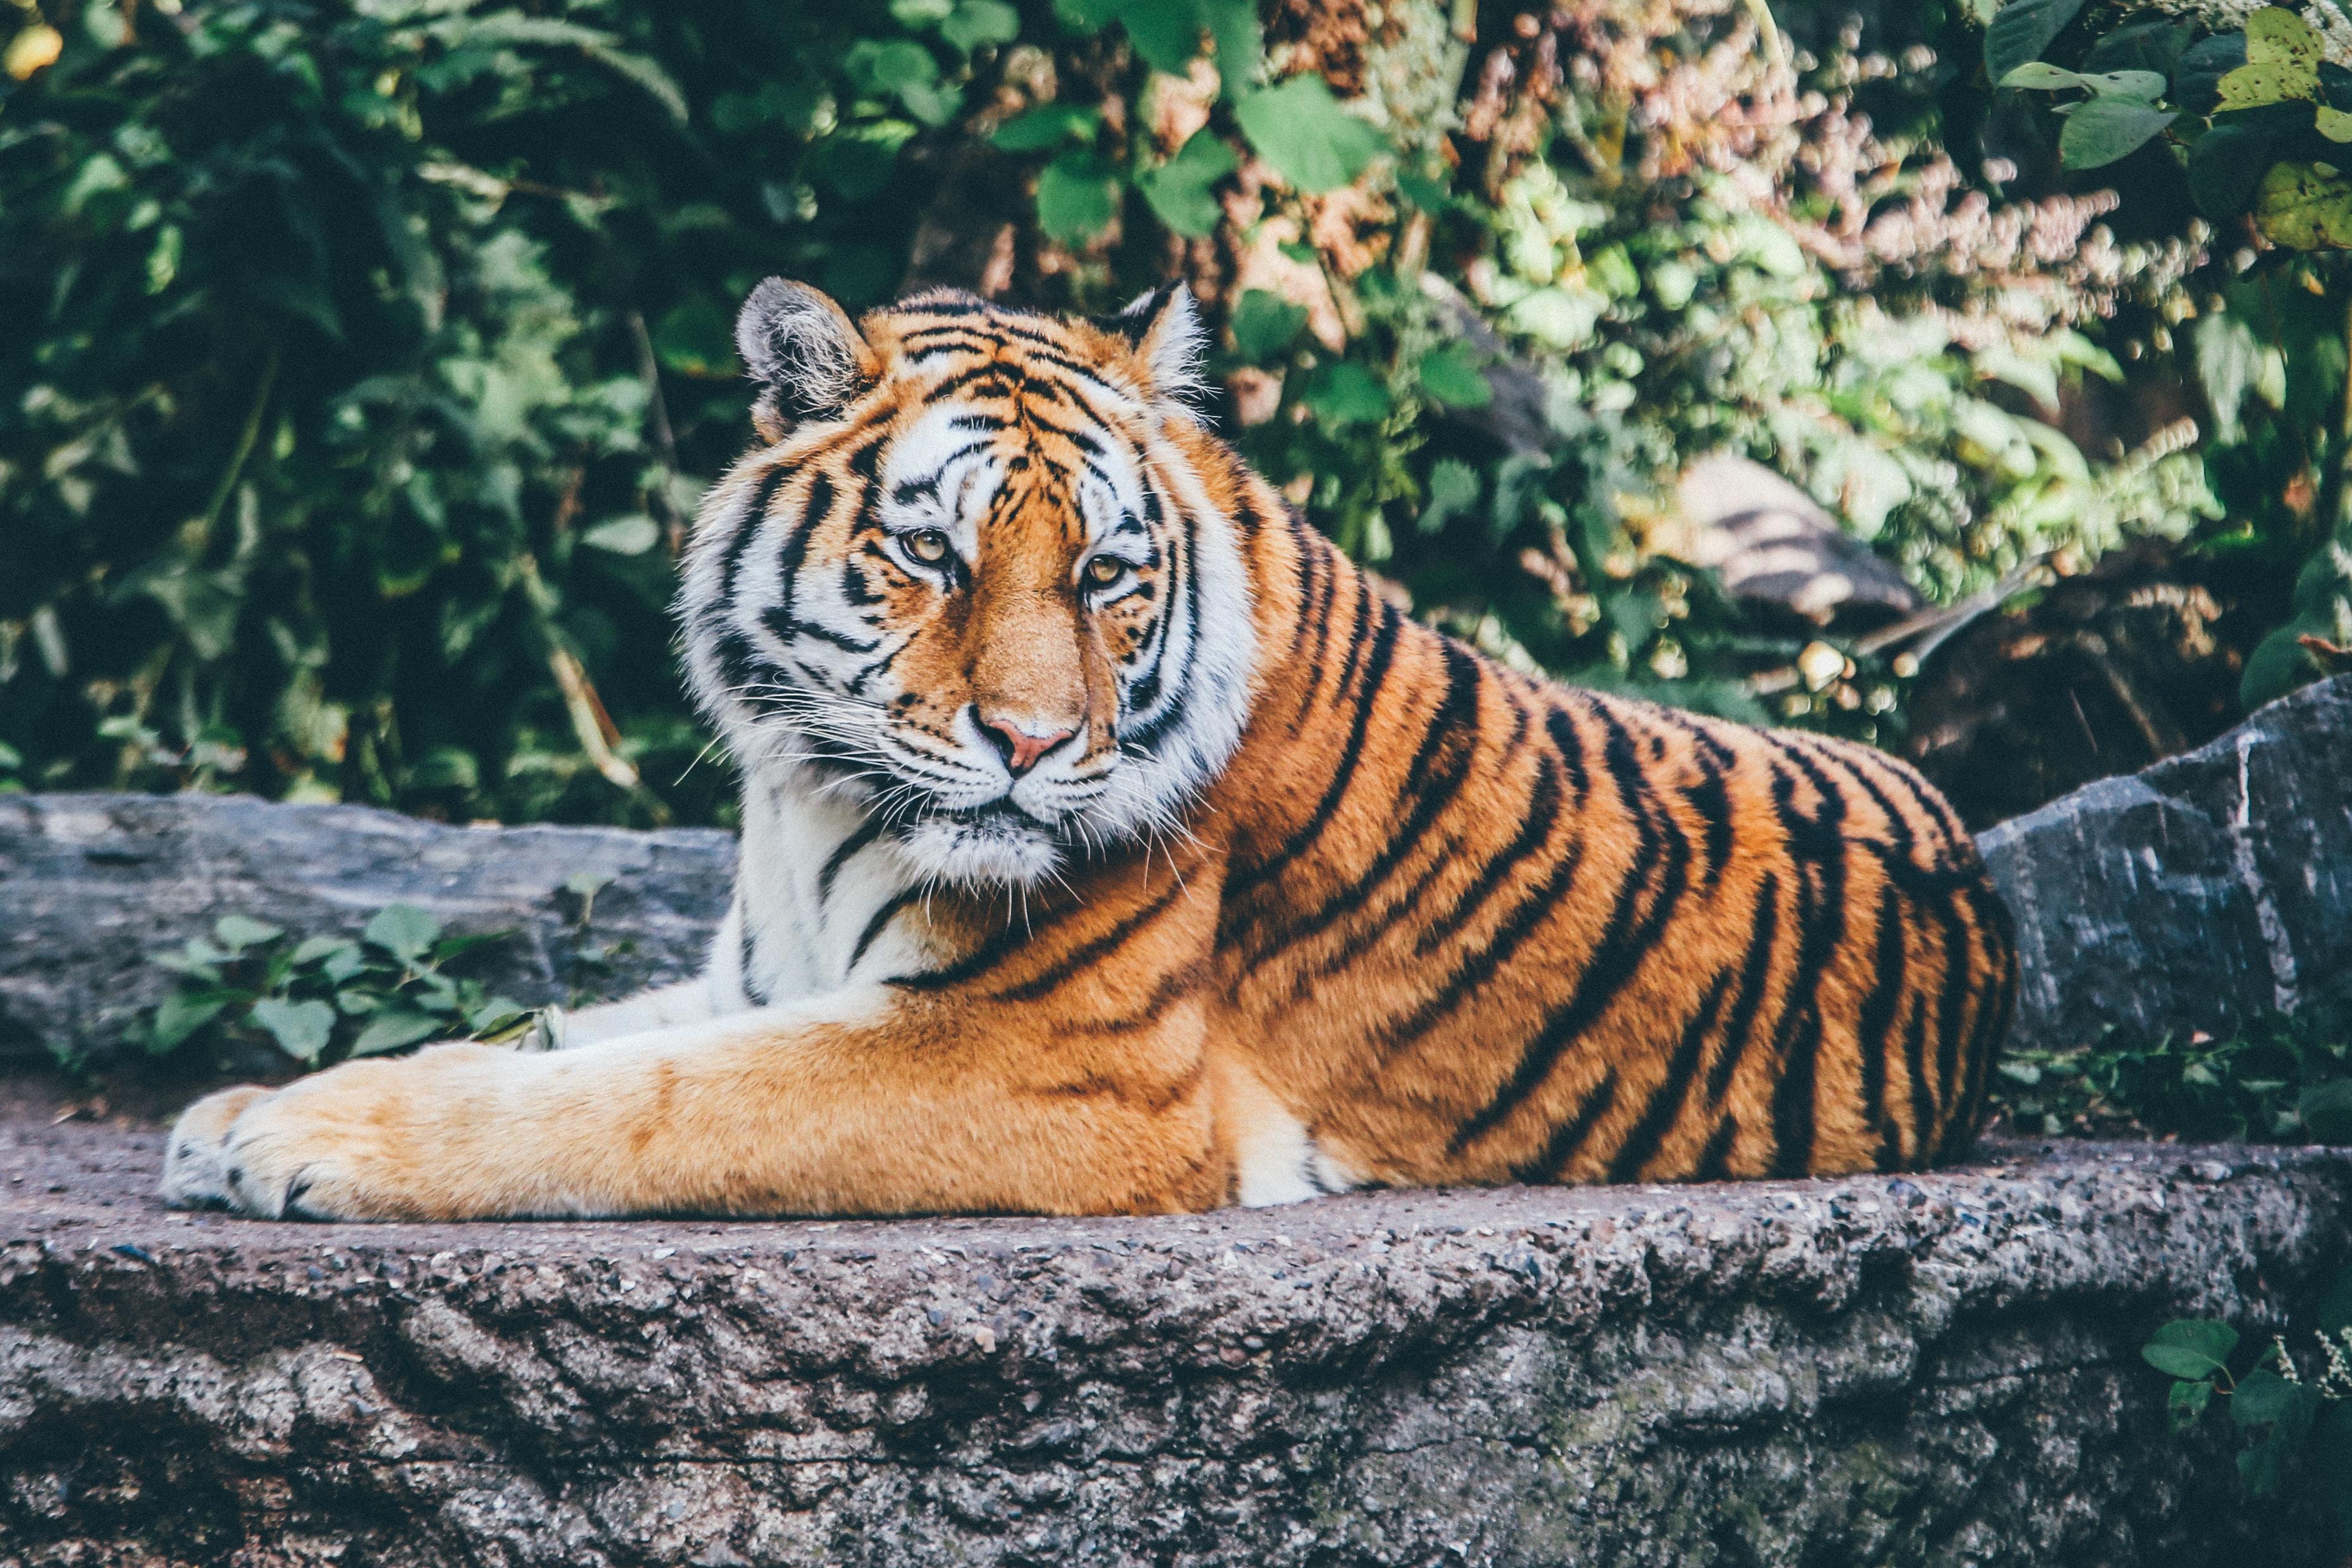 orange tiger on grey concrete flooring